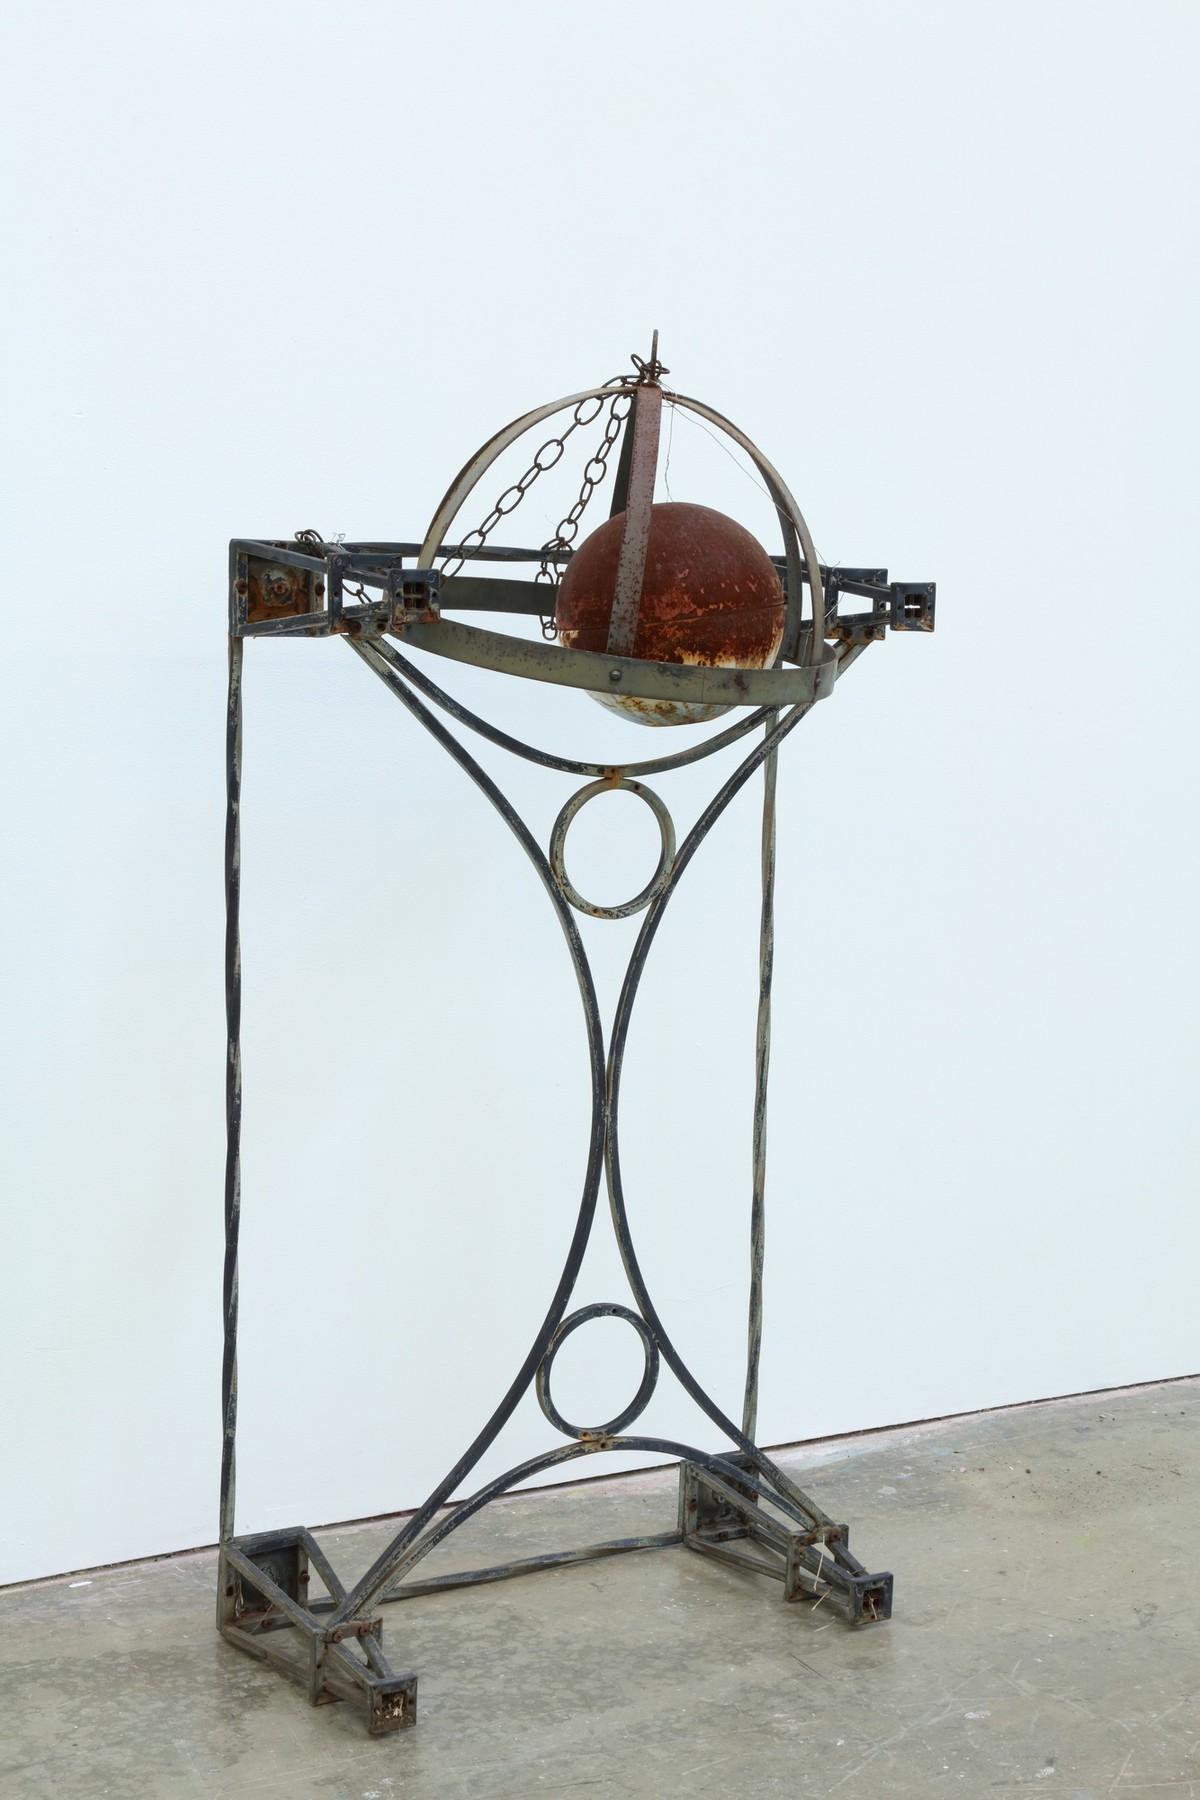 Joe Minter at Atlanta Contemporary